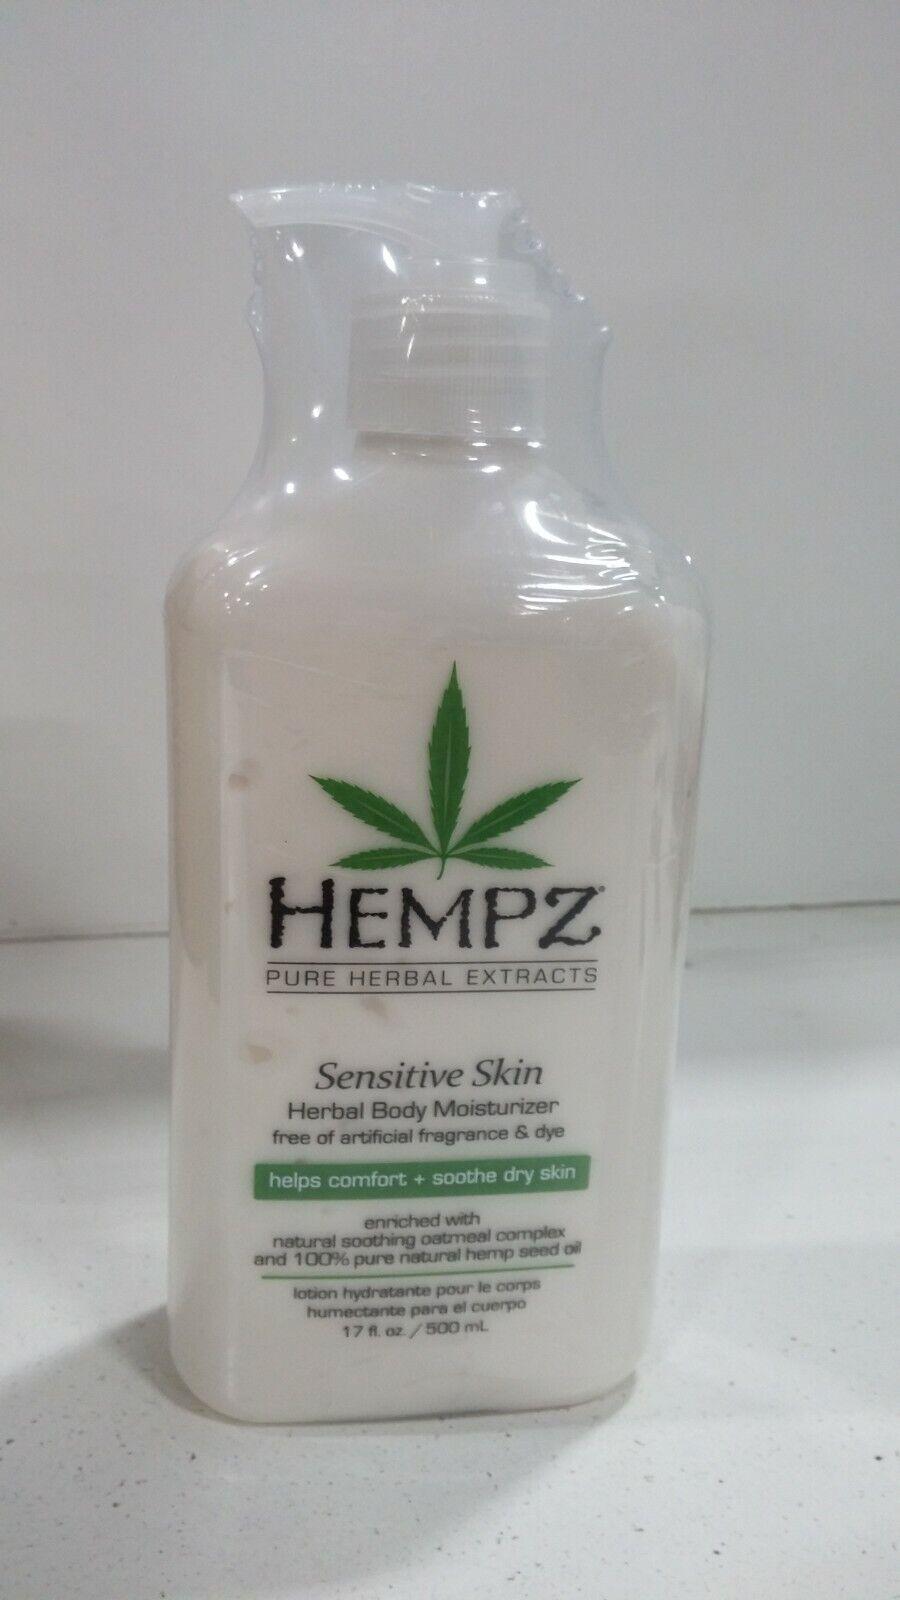 Hempz Sensitive Skin Herbal Body Moisturizer, Off White, 17